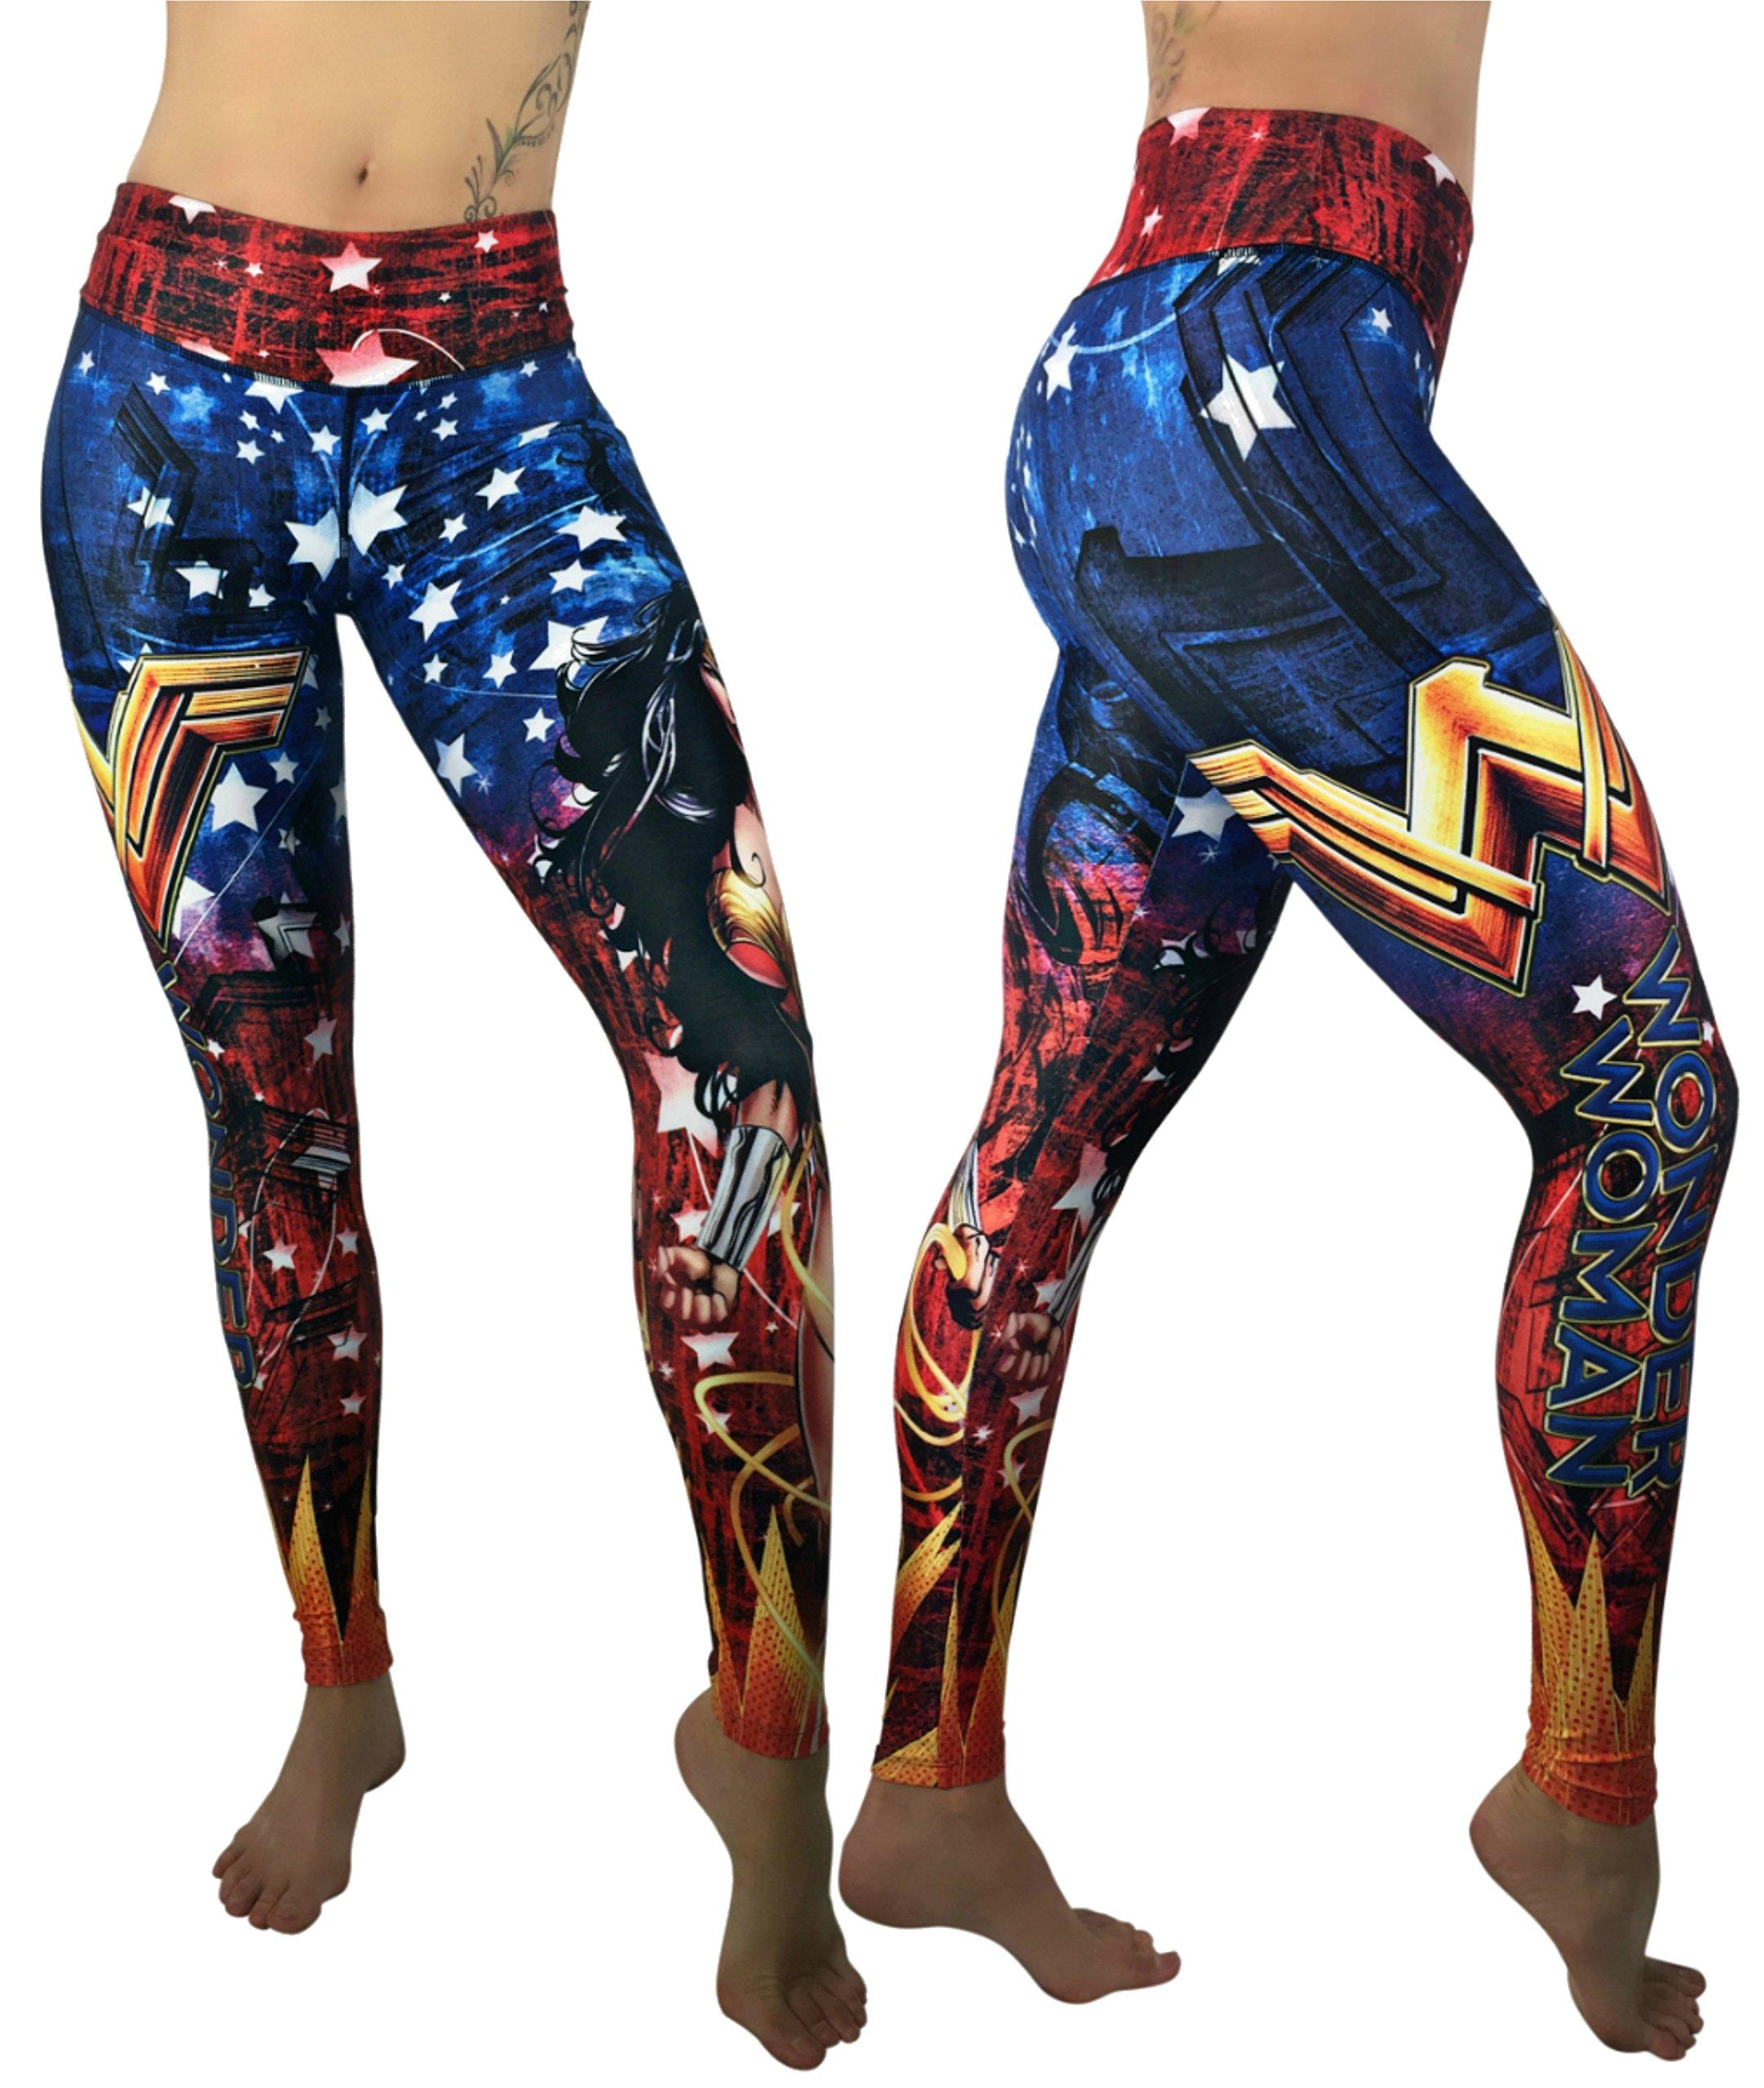 Activewear Superhero Many Styles Leggings Yoga Pants Compression Tights (Wonder Woman 3)